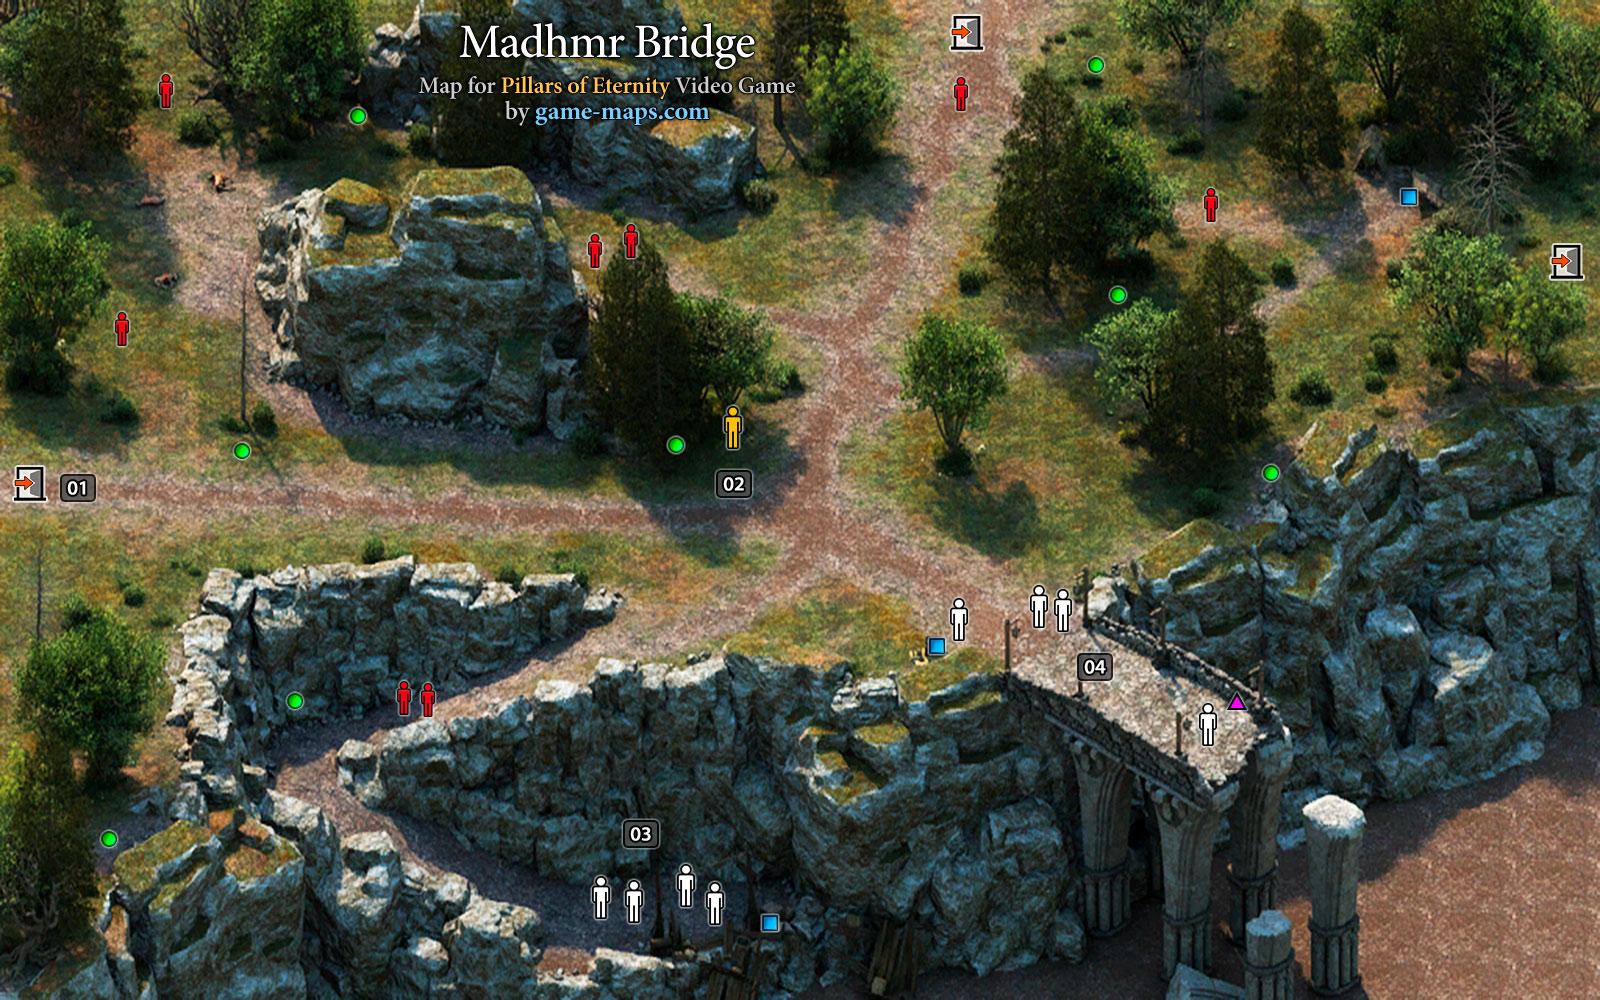 Madhmr Bridge - Pillars of Eternity  game-maps.com